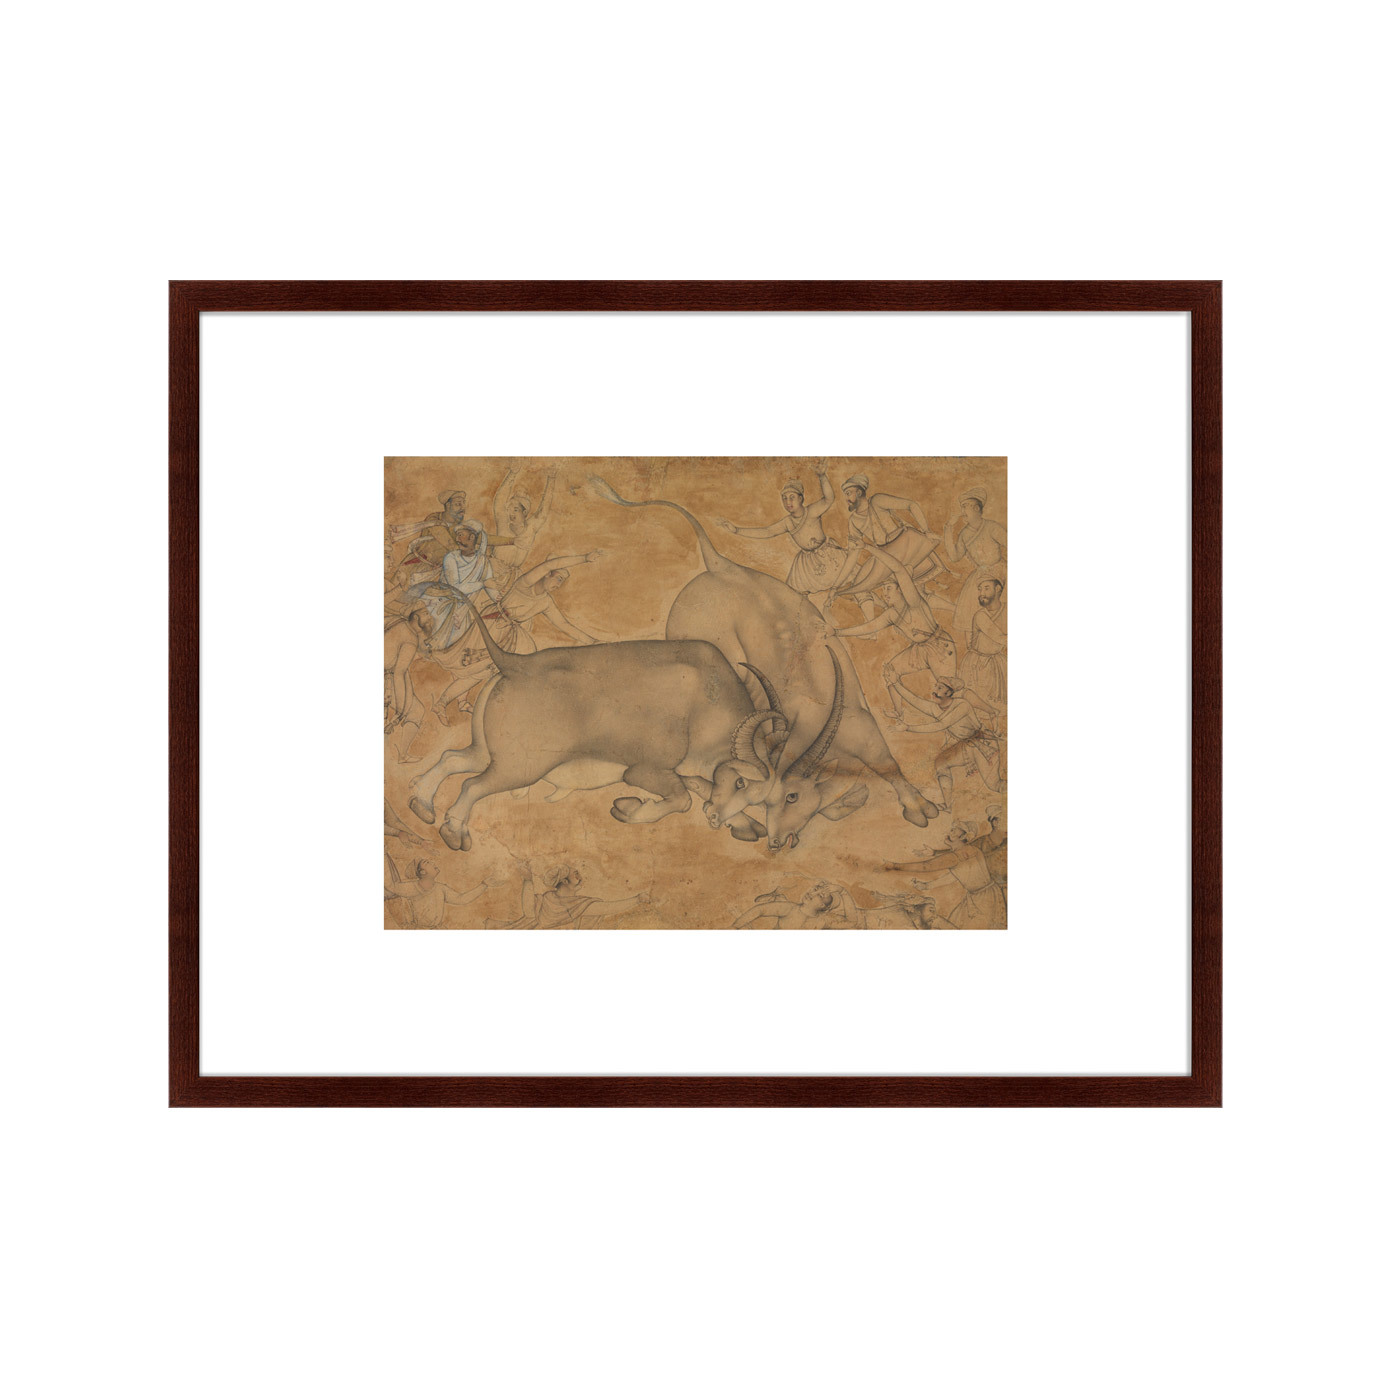 {} Картины в Квартиру Картина Битва быков (79х100 см) картины в квартиру картина вектор 79х100 см